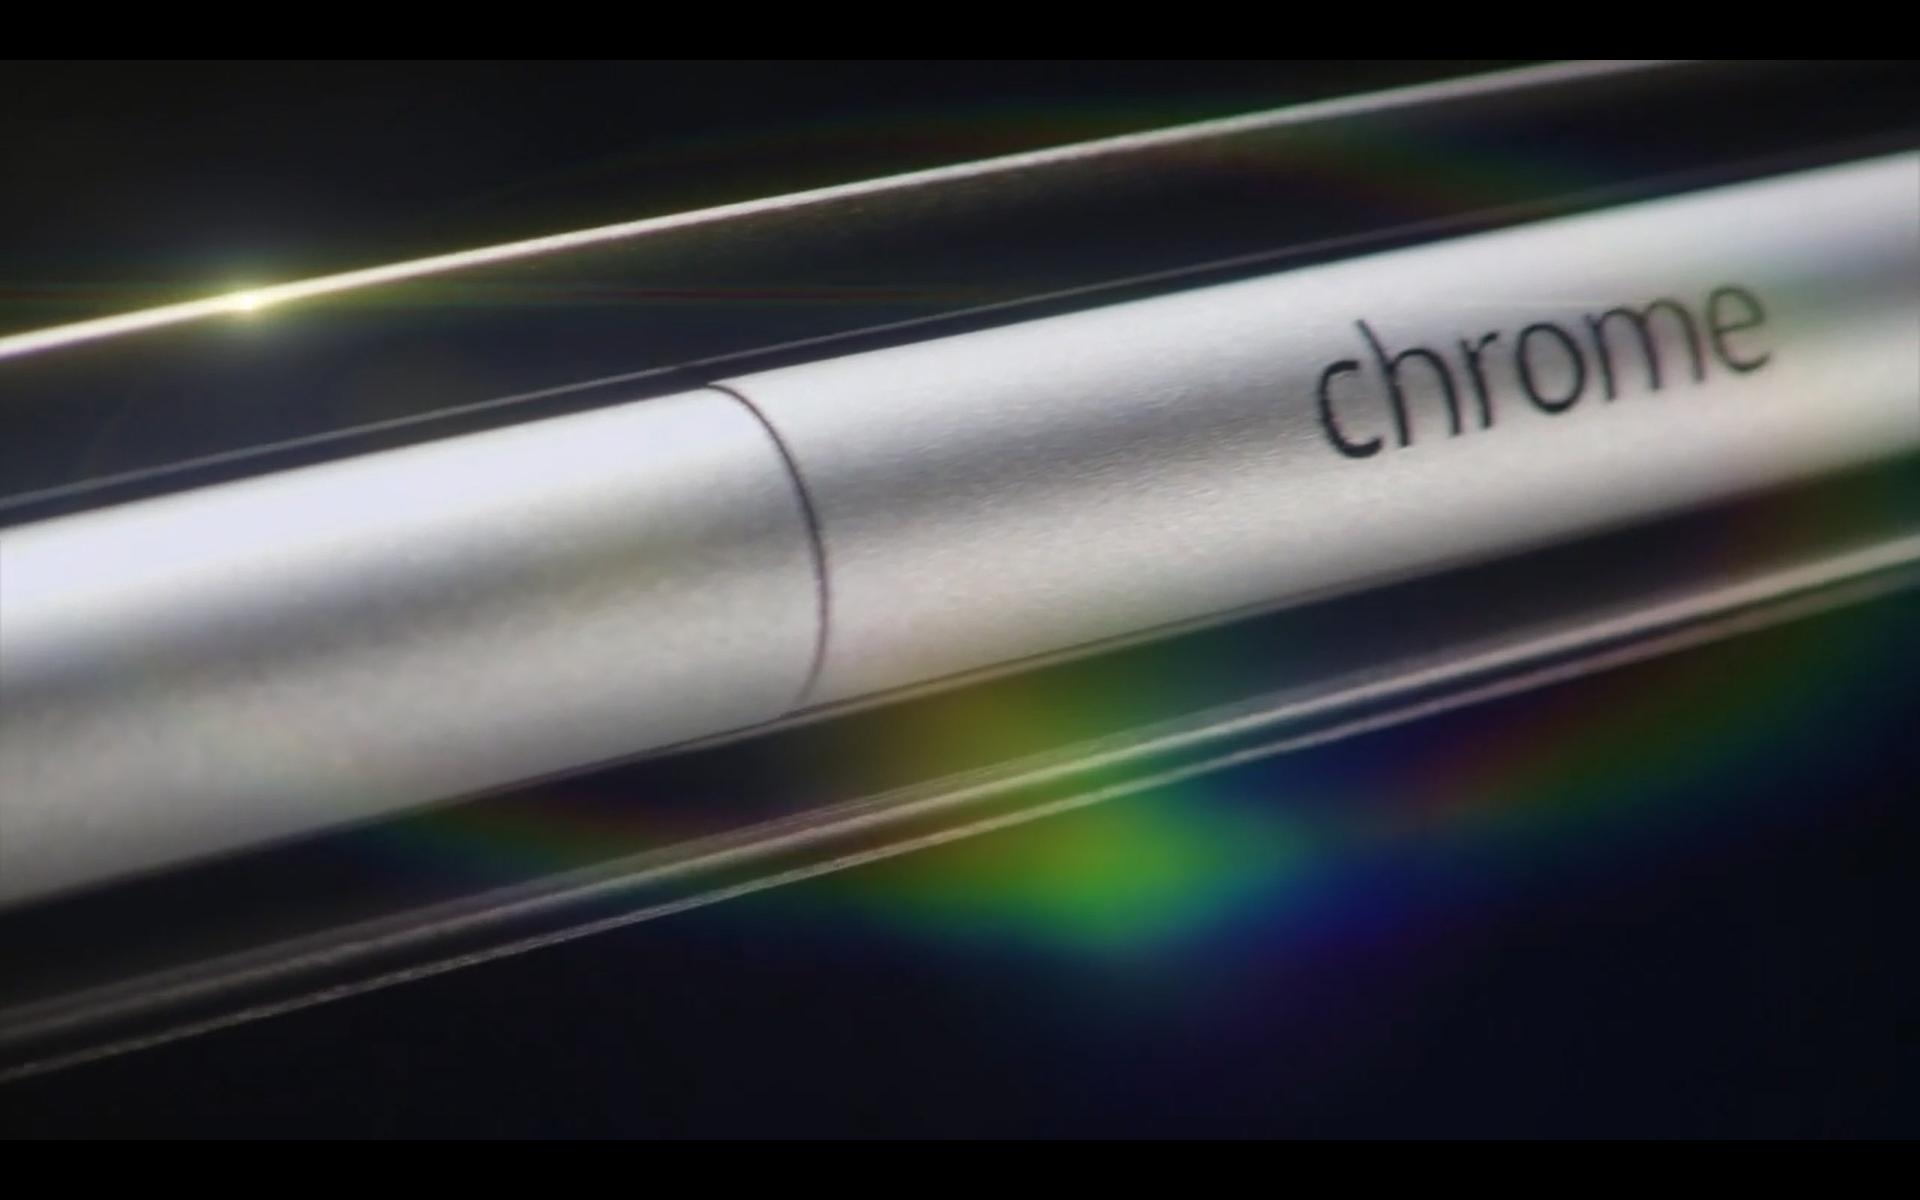 Codename 'Puppy': Google testet Chromebook mit NVIDIA Tegra 4